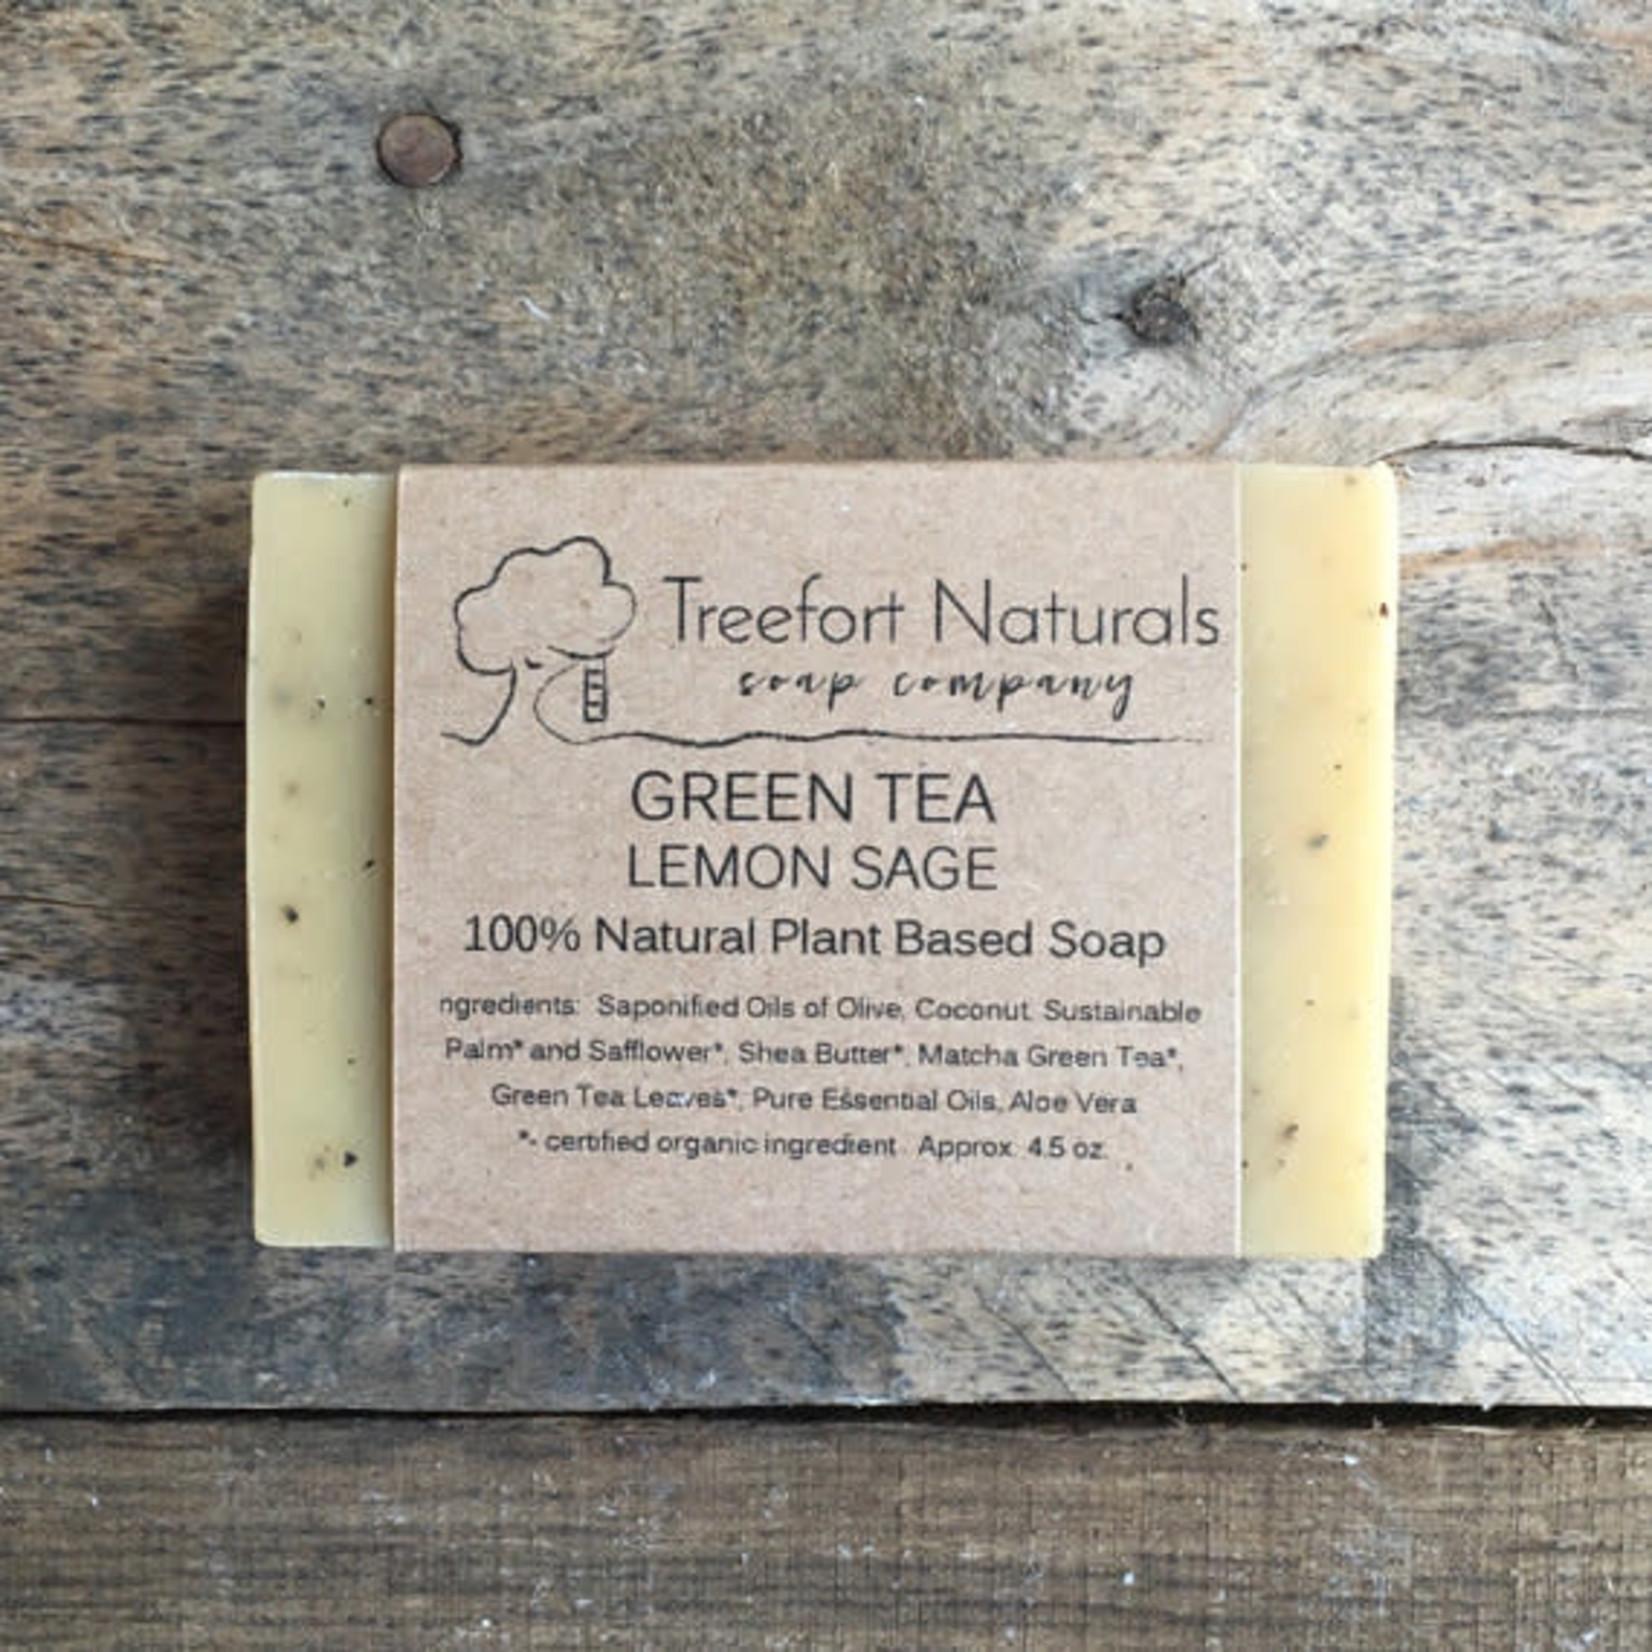 Treefort Naturals Treefort Naturals Green Tea Lemon Sage Soap